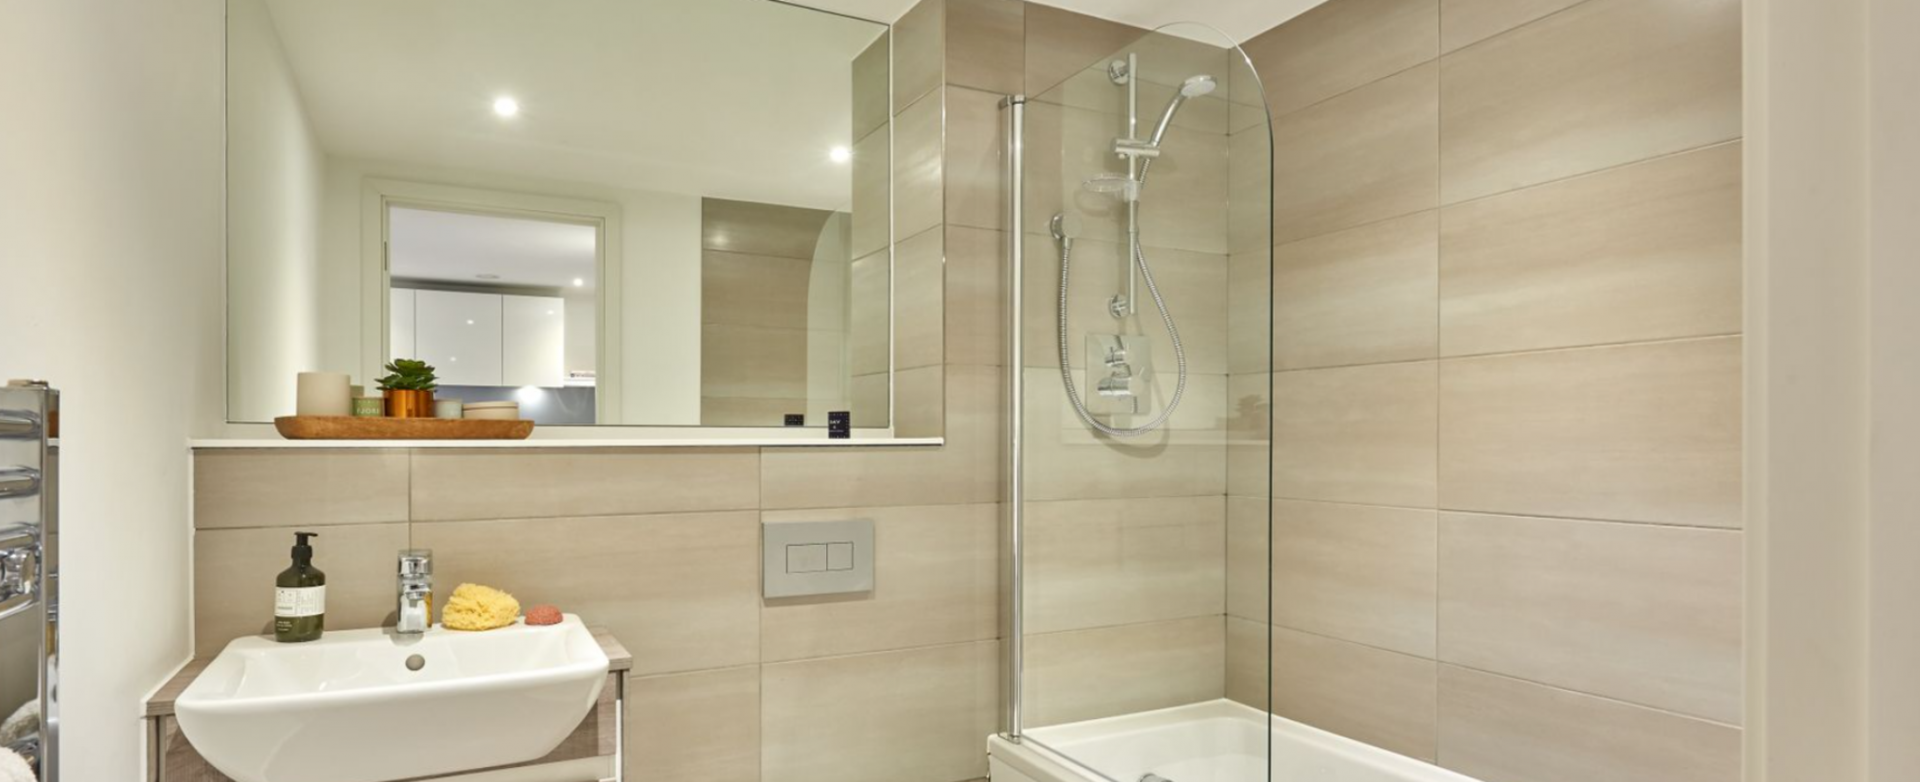 Bathroom at Charles Hope Birmingham Central Apartments, Westside, Birmingham - Citybase Apartments